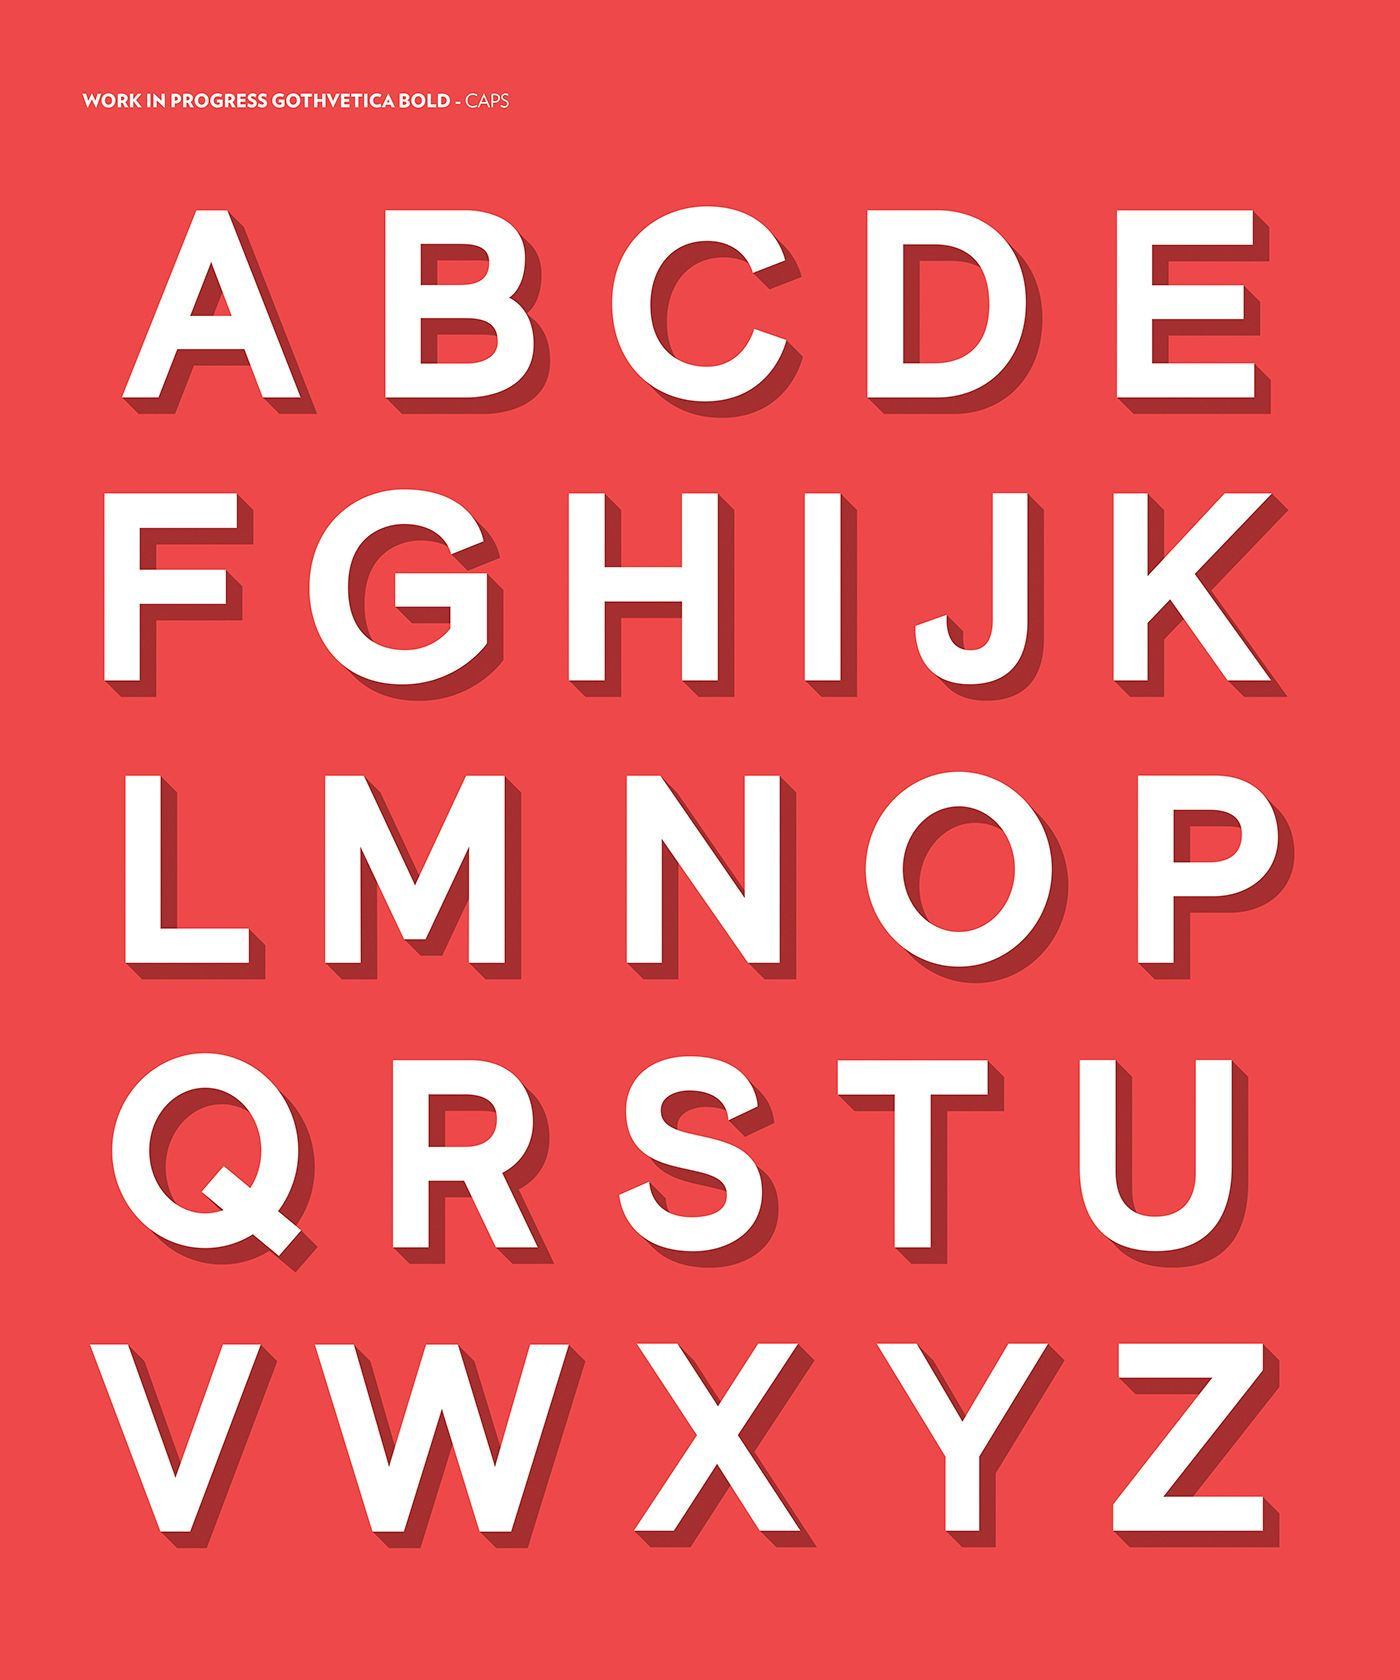 Download Gothvetica (Free Font) on Behance | Free font, Logo fonts ...